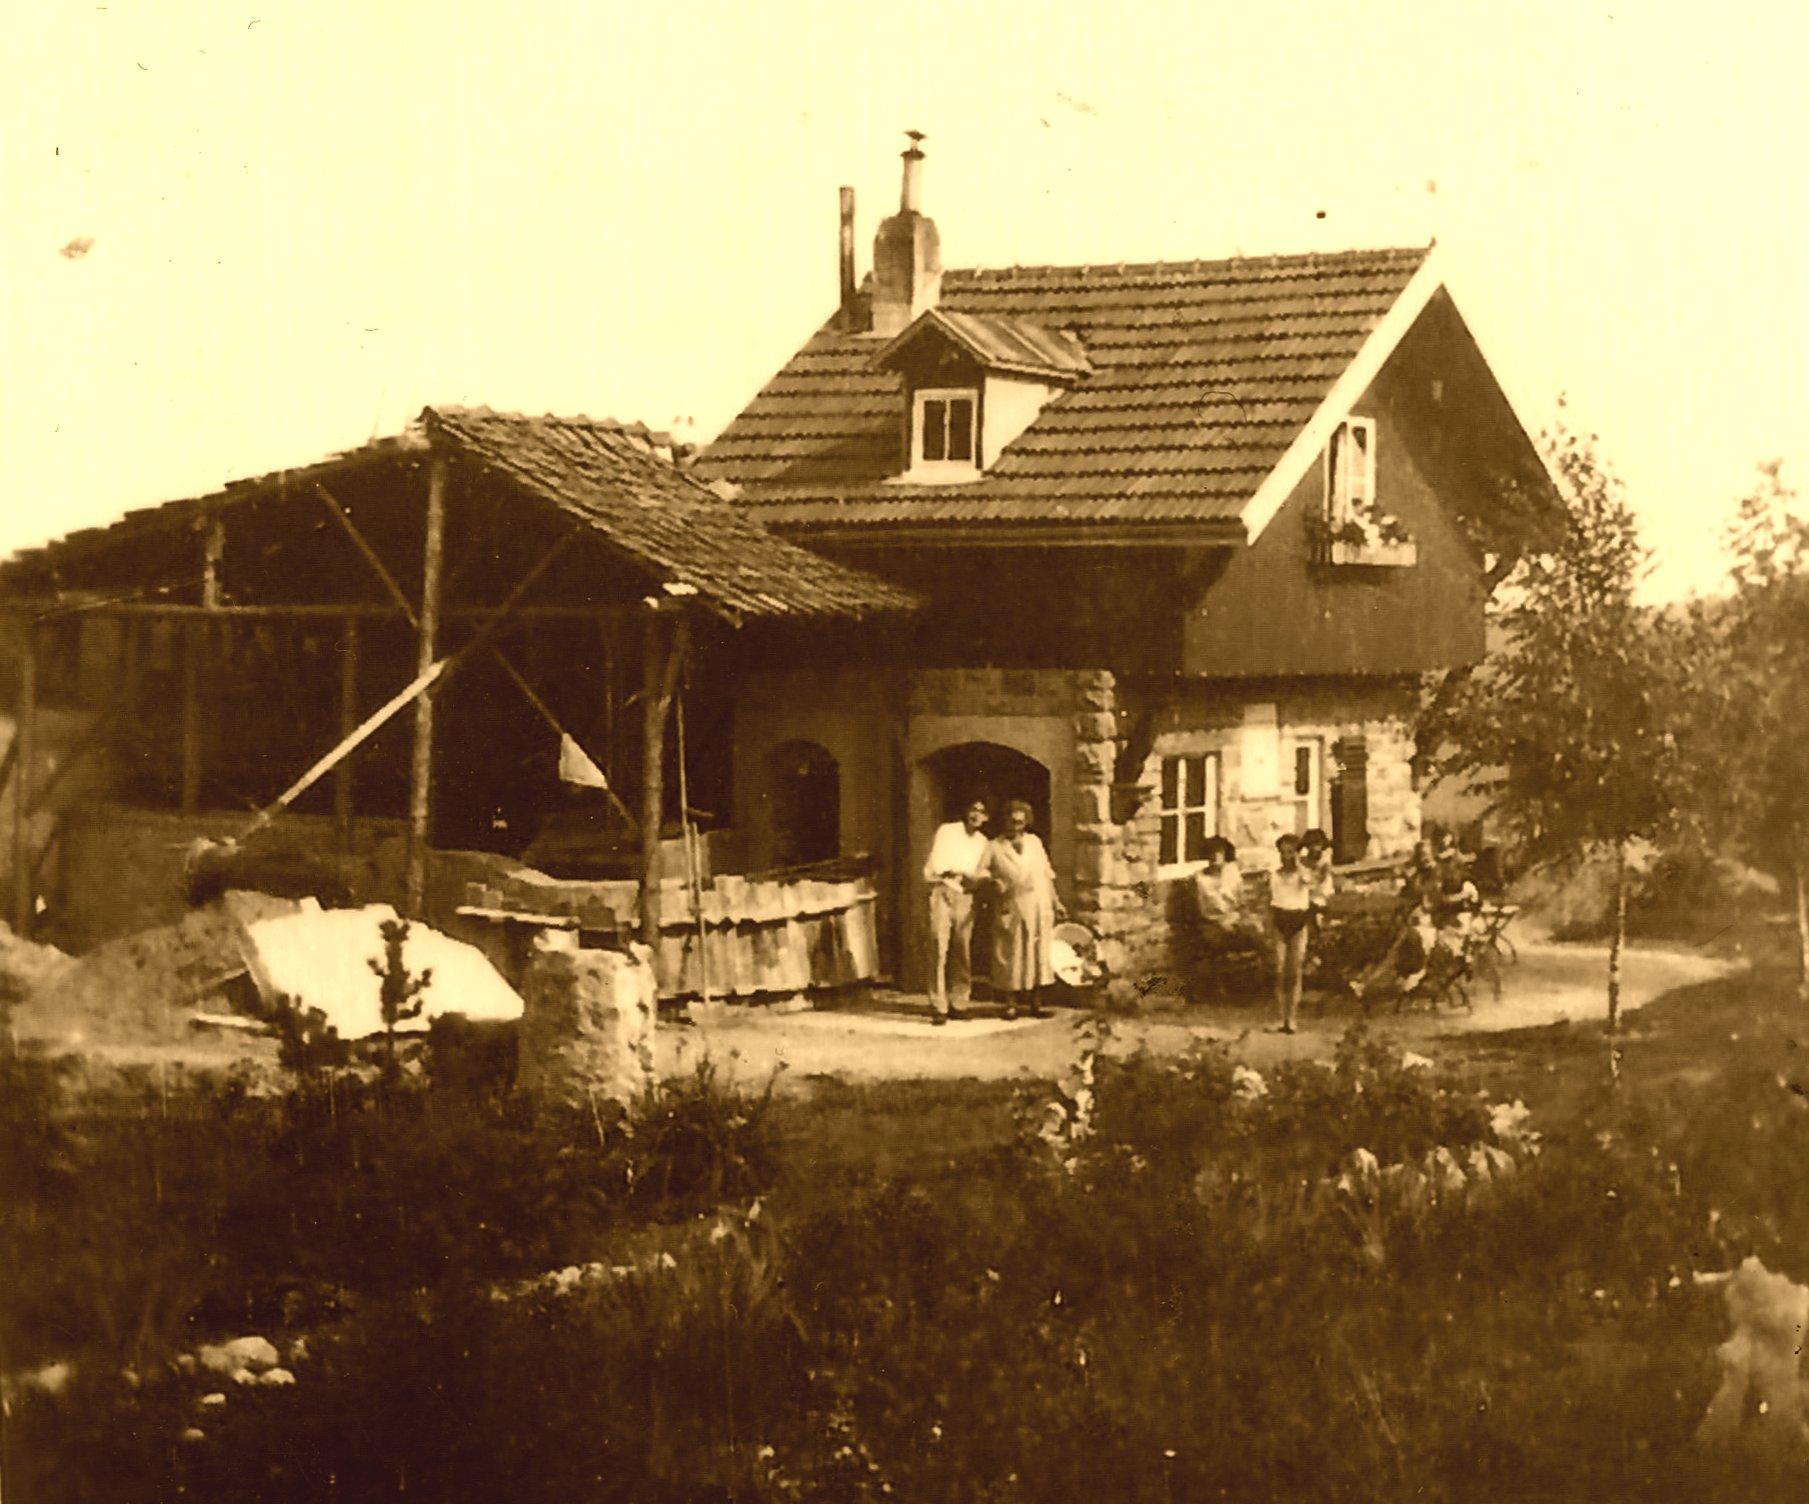 Beginn der Bauarbeiten 1932